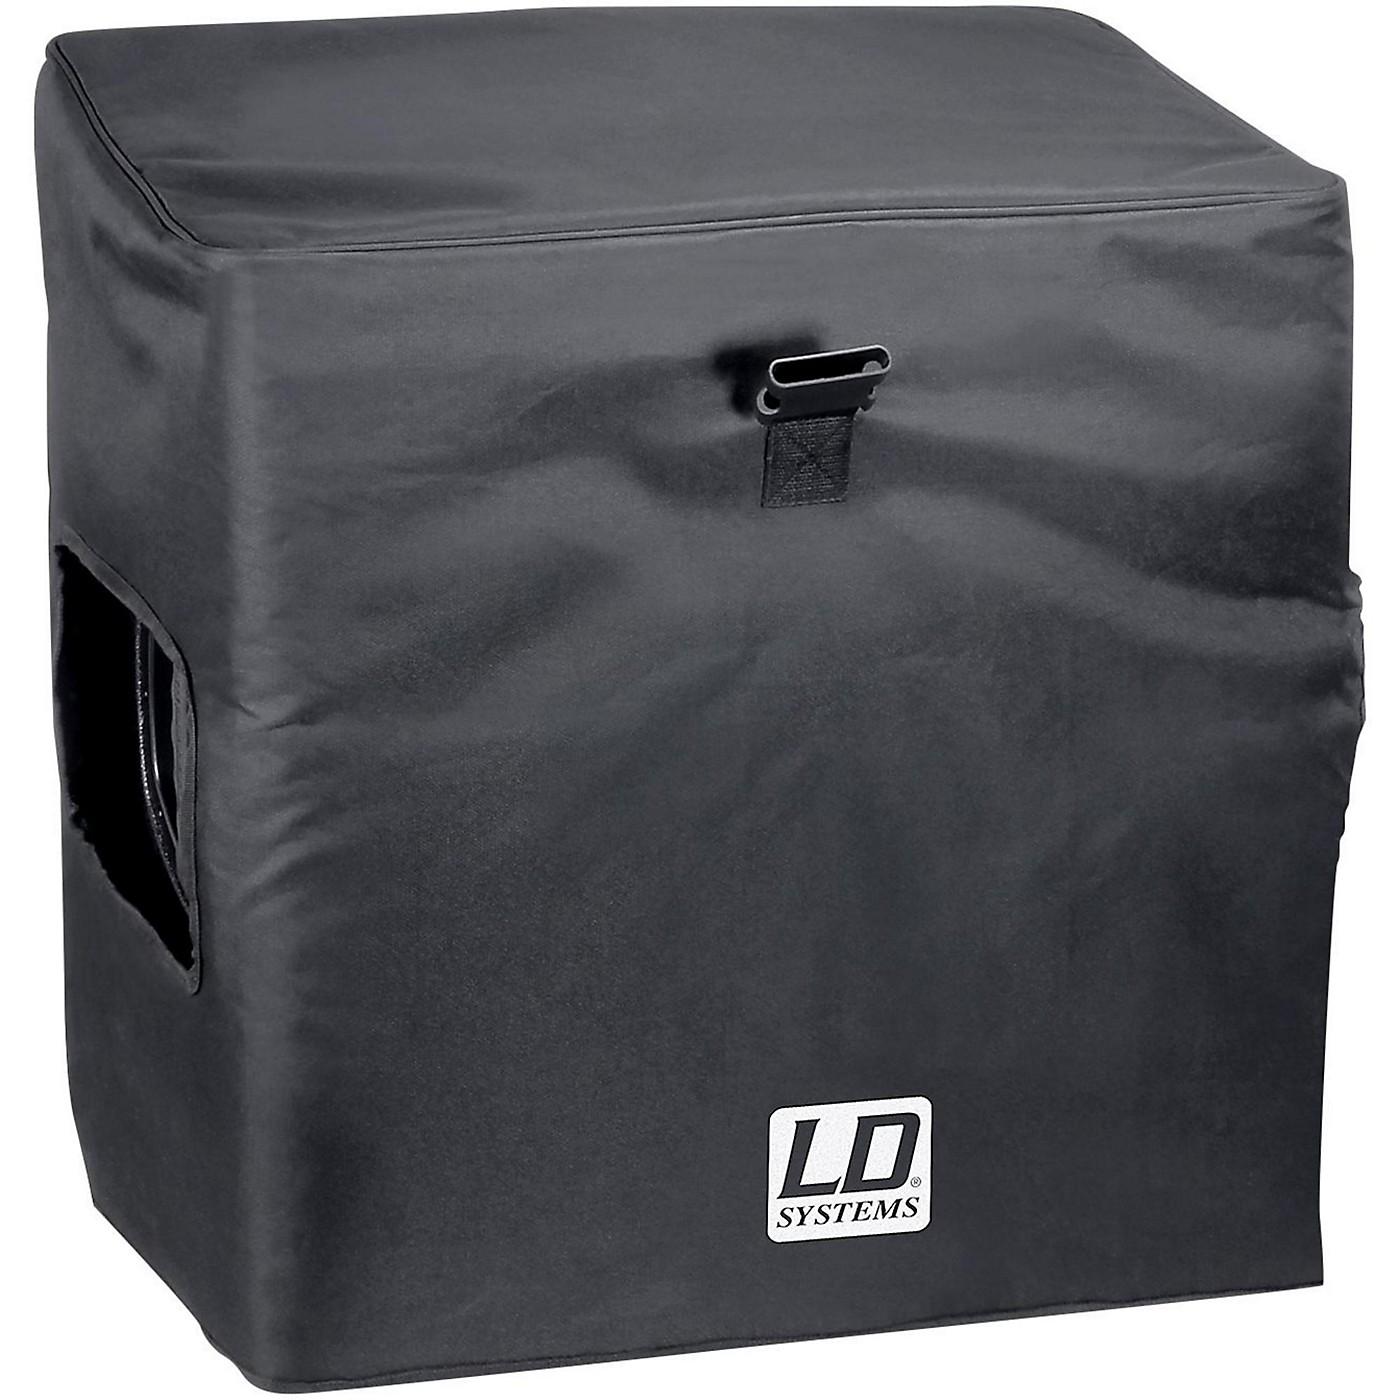 LD Systems MAUI 44 Sub Protective Cover thumbnail